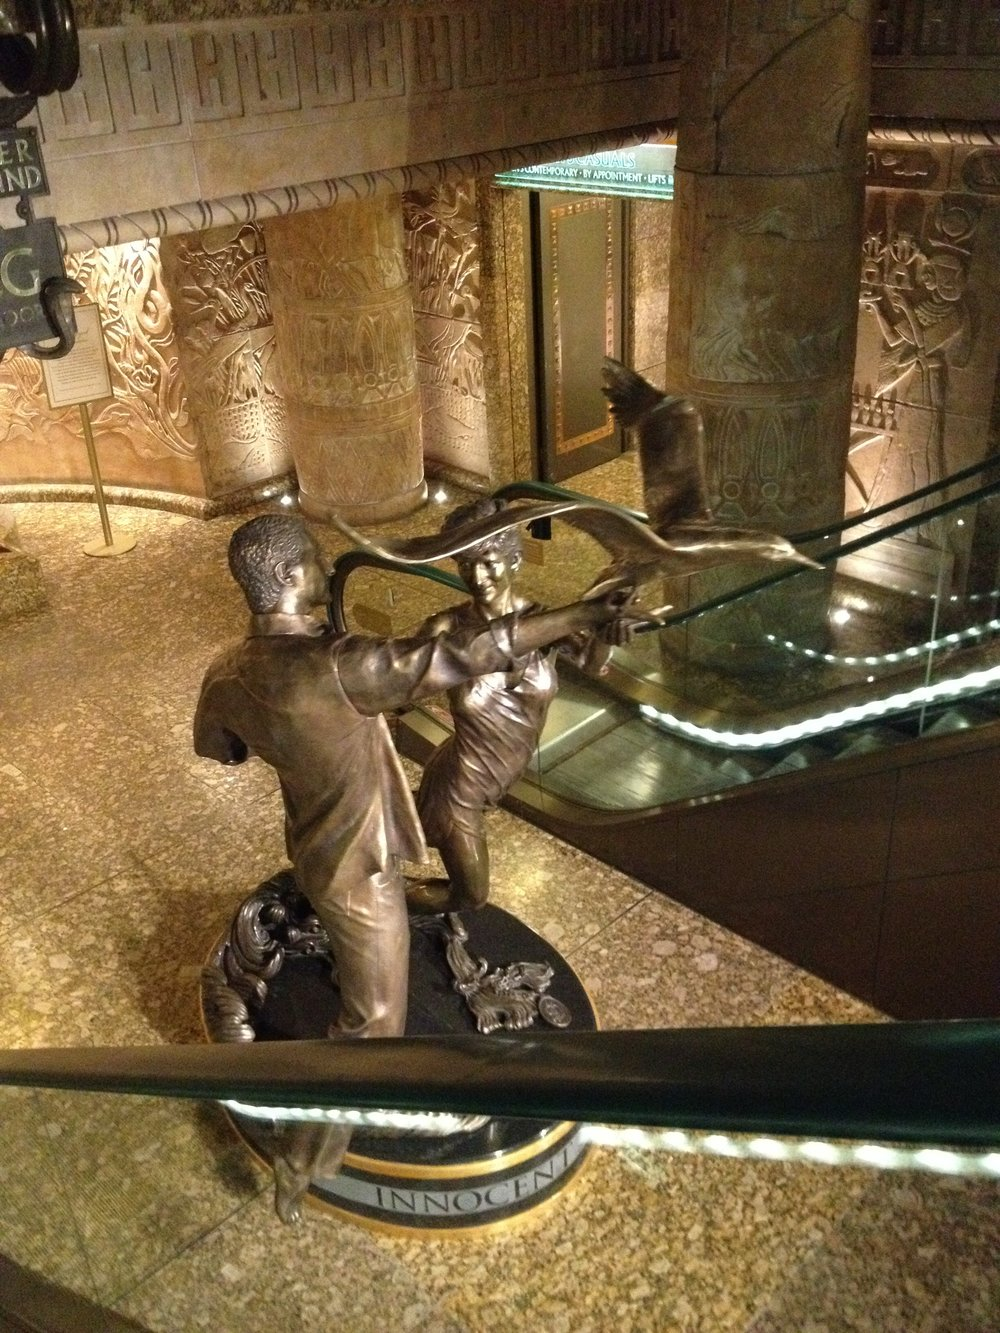 The Dodi & Diana memorial at the bottom of the Egyptian escalator